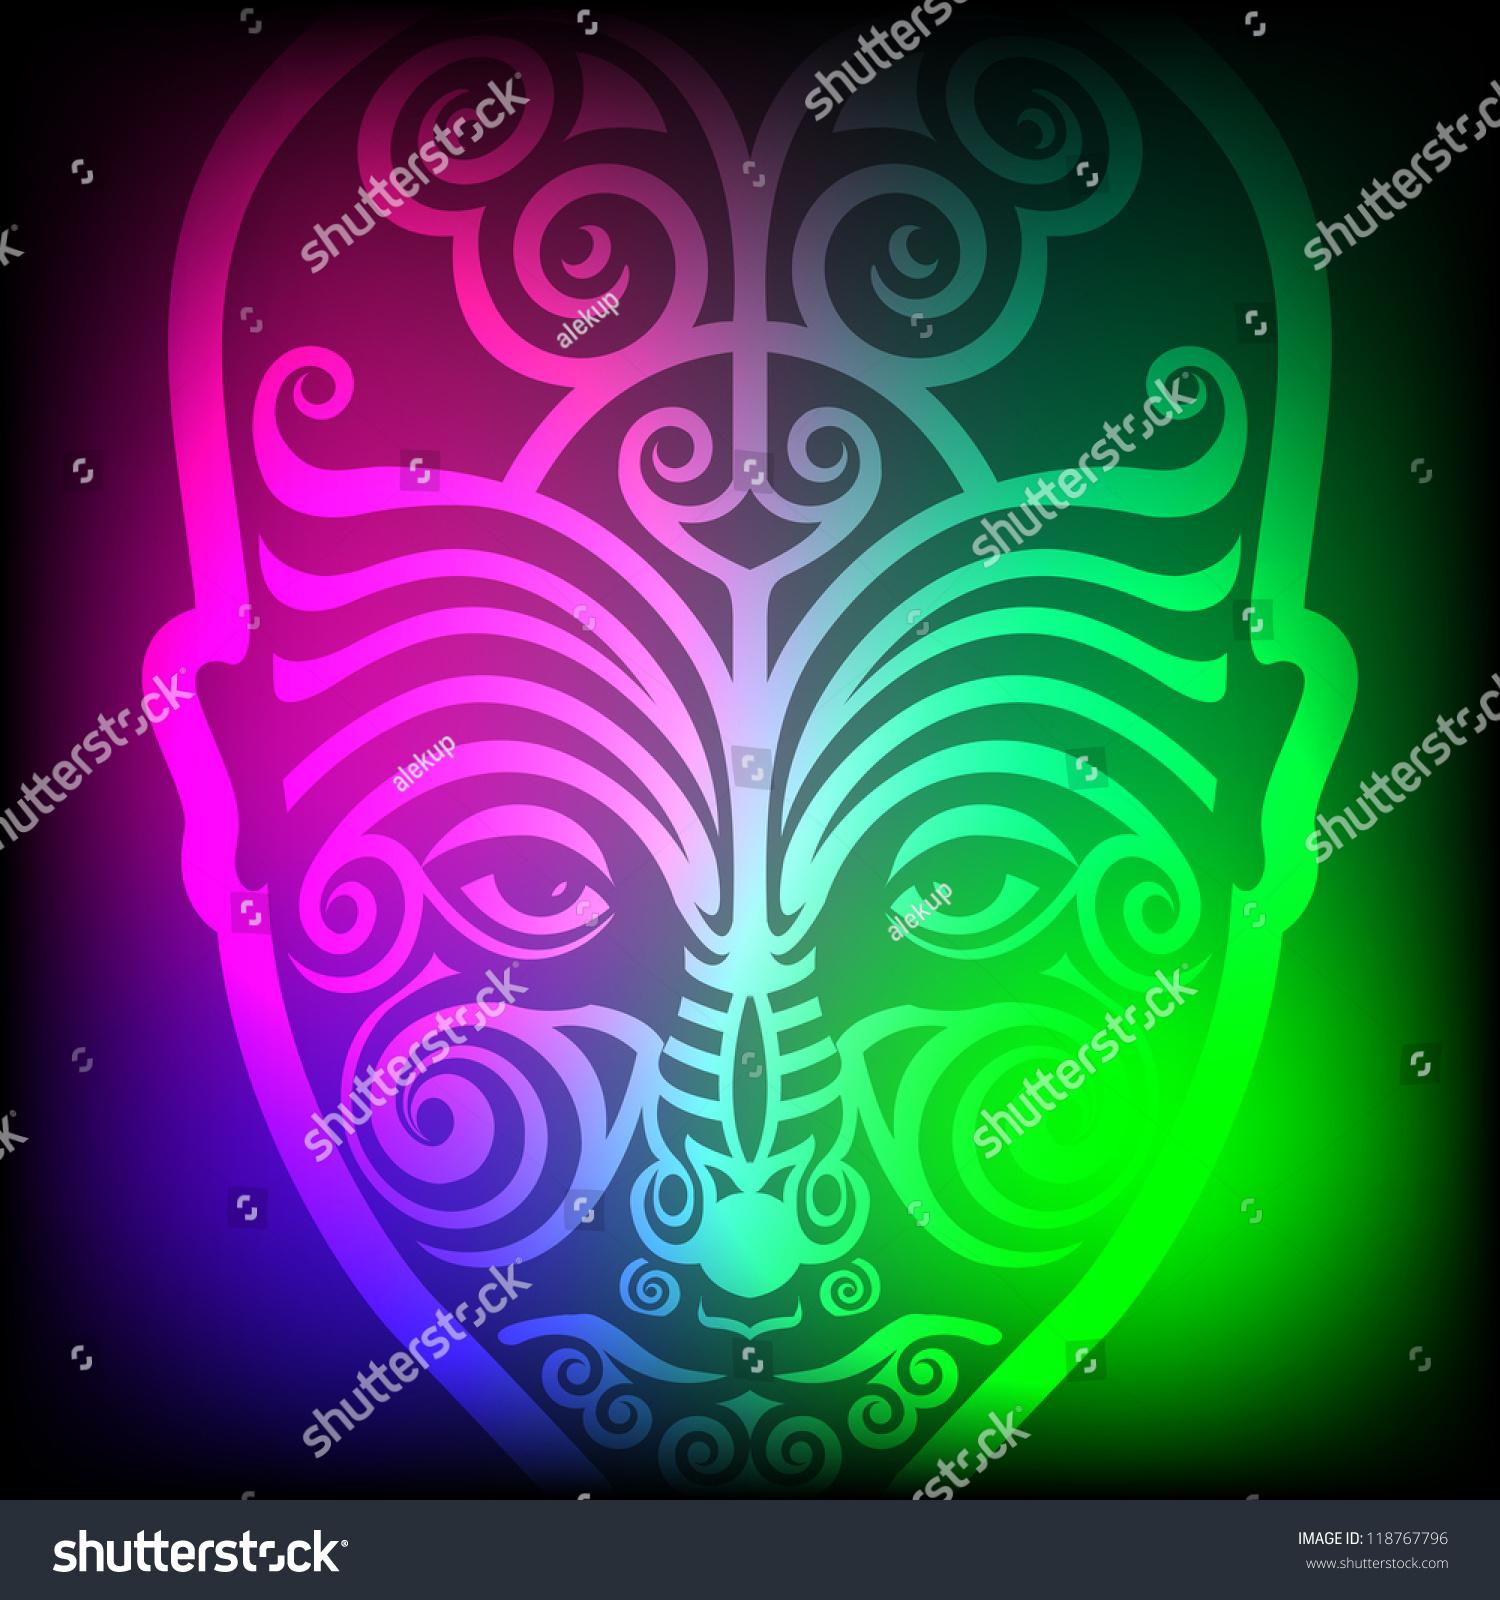 Maori Tattoo Designs Wallpaper: Maori Face Tattoo On Colorful Background Stock Vector